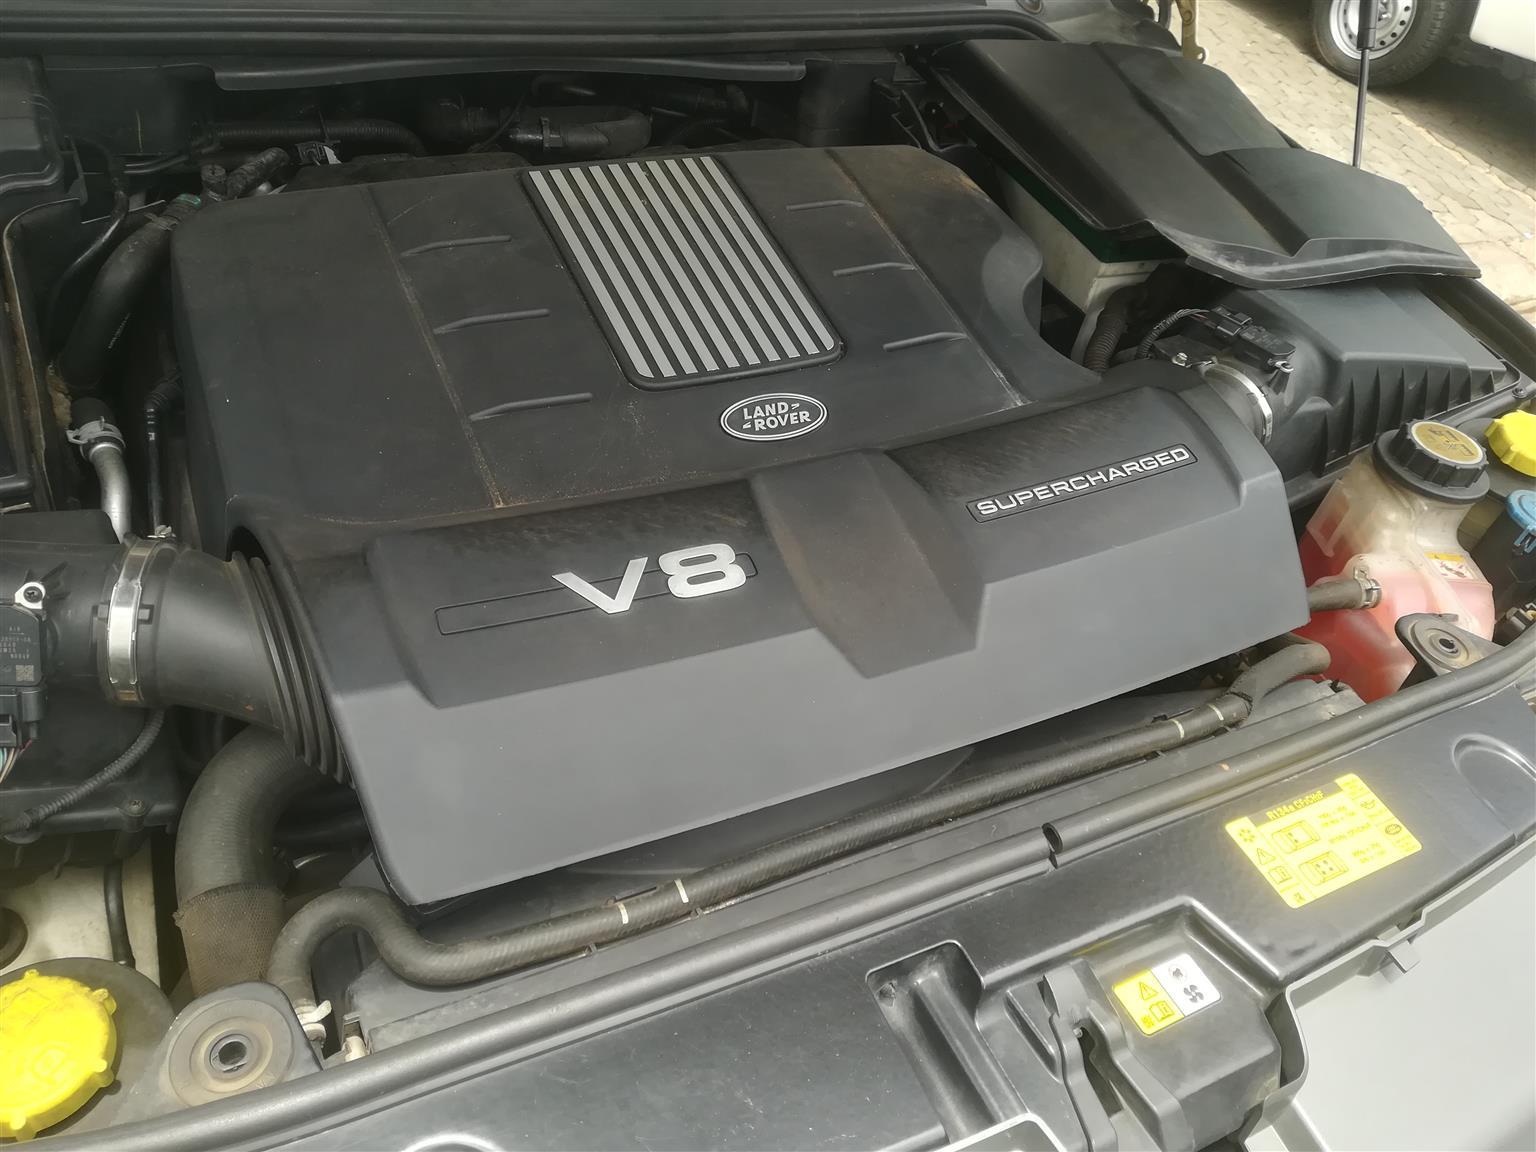 2010 Land Rover Range Rover Sport RANGE ROVER SPORT 5.0 V8 S/C AUTOBIO DYNAMIC